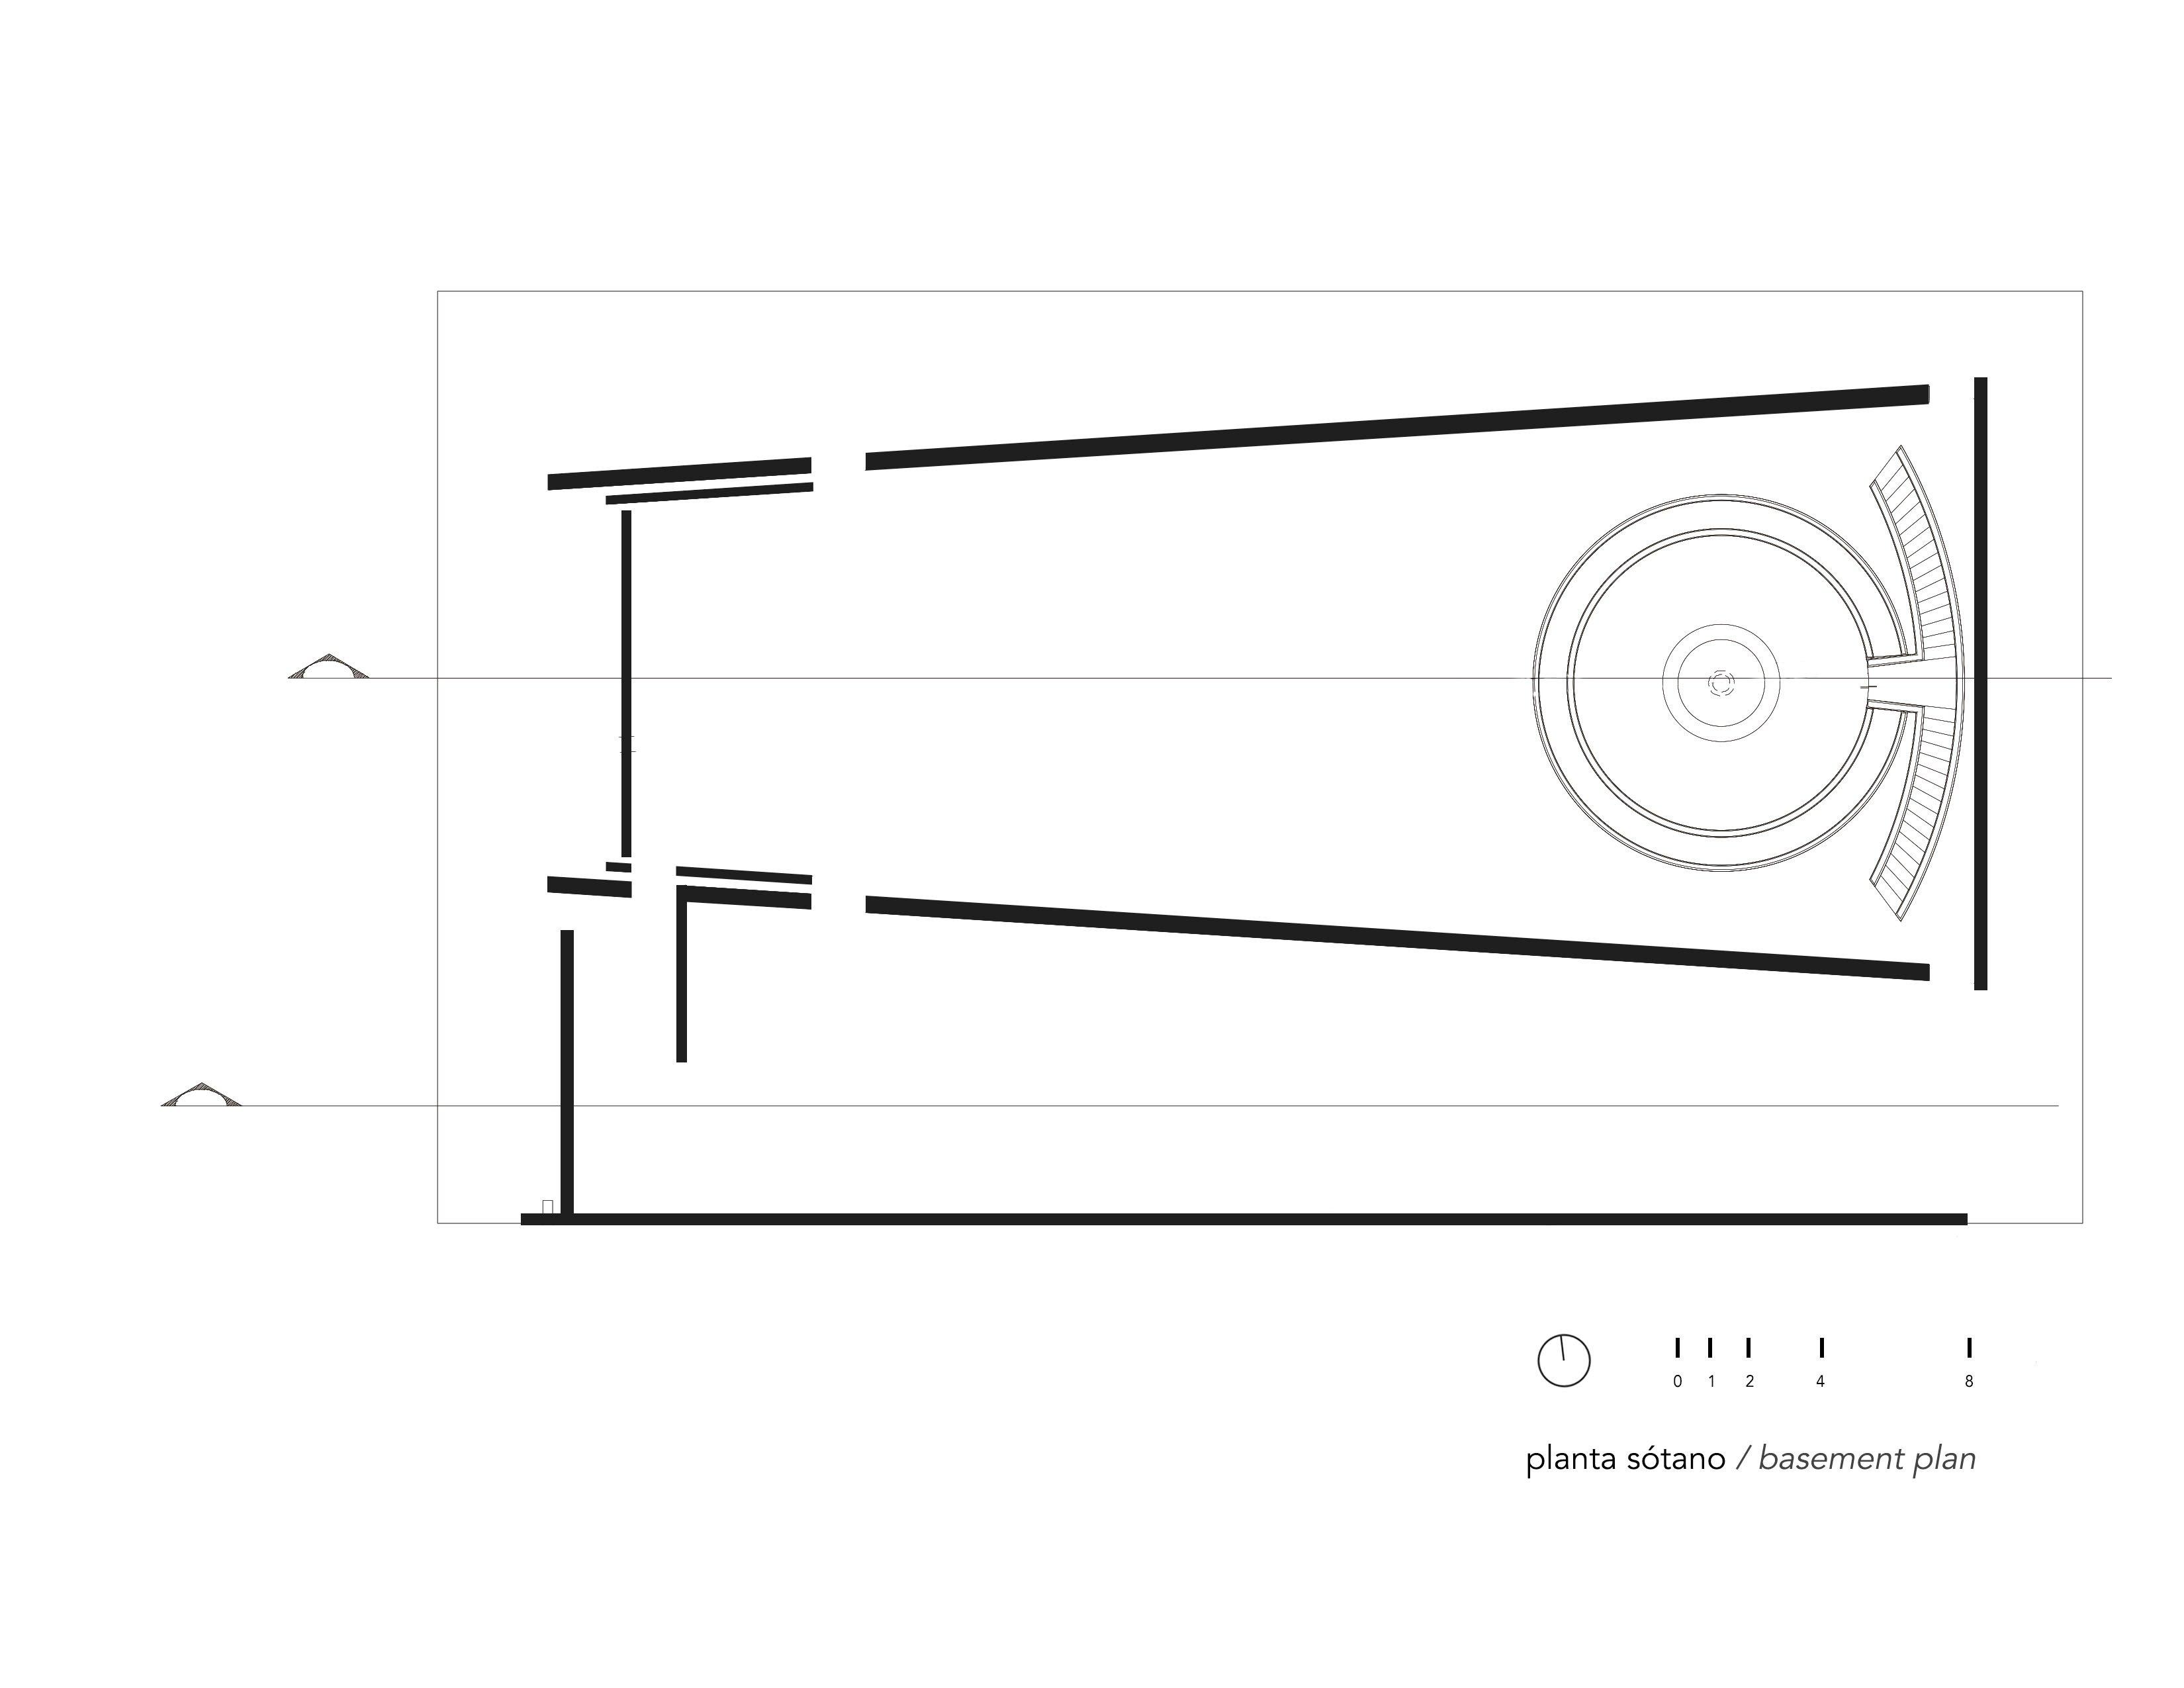 Basement plan Ricardo Yslas Gámez Arquitectos}